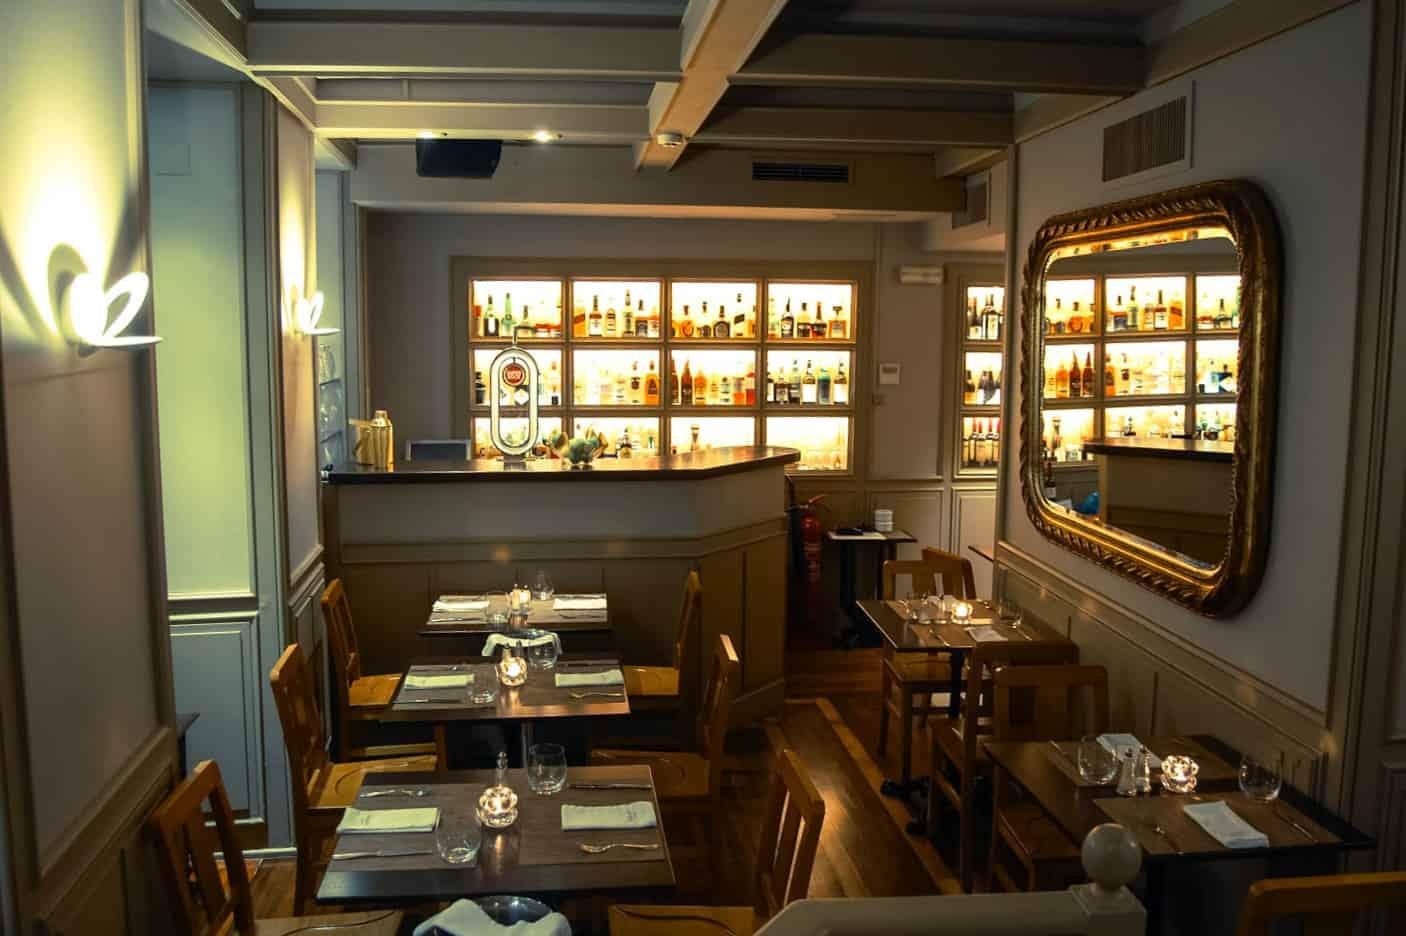 Versiculo D'o Faia meilleur restaurant Lisbonne